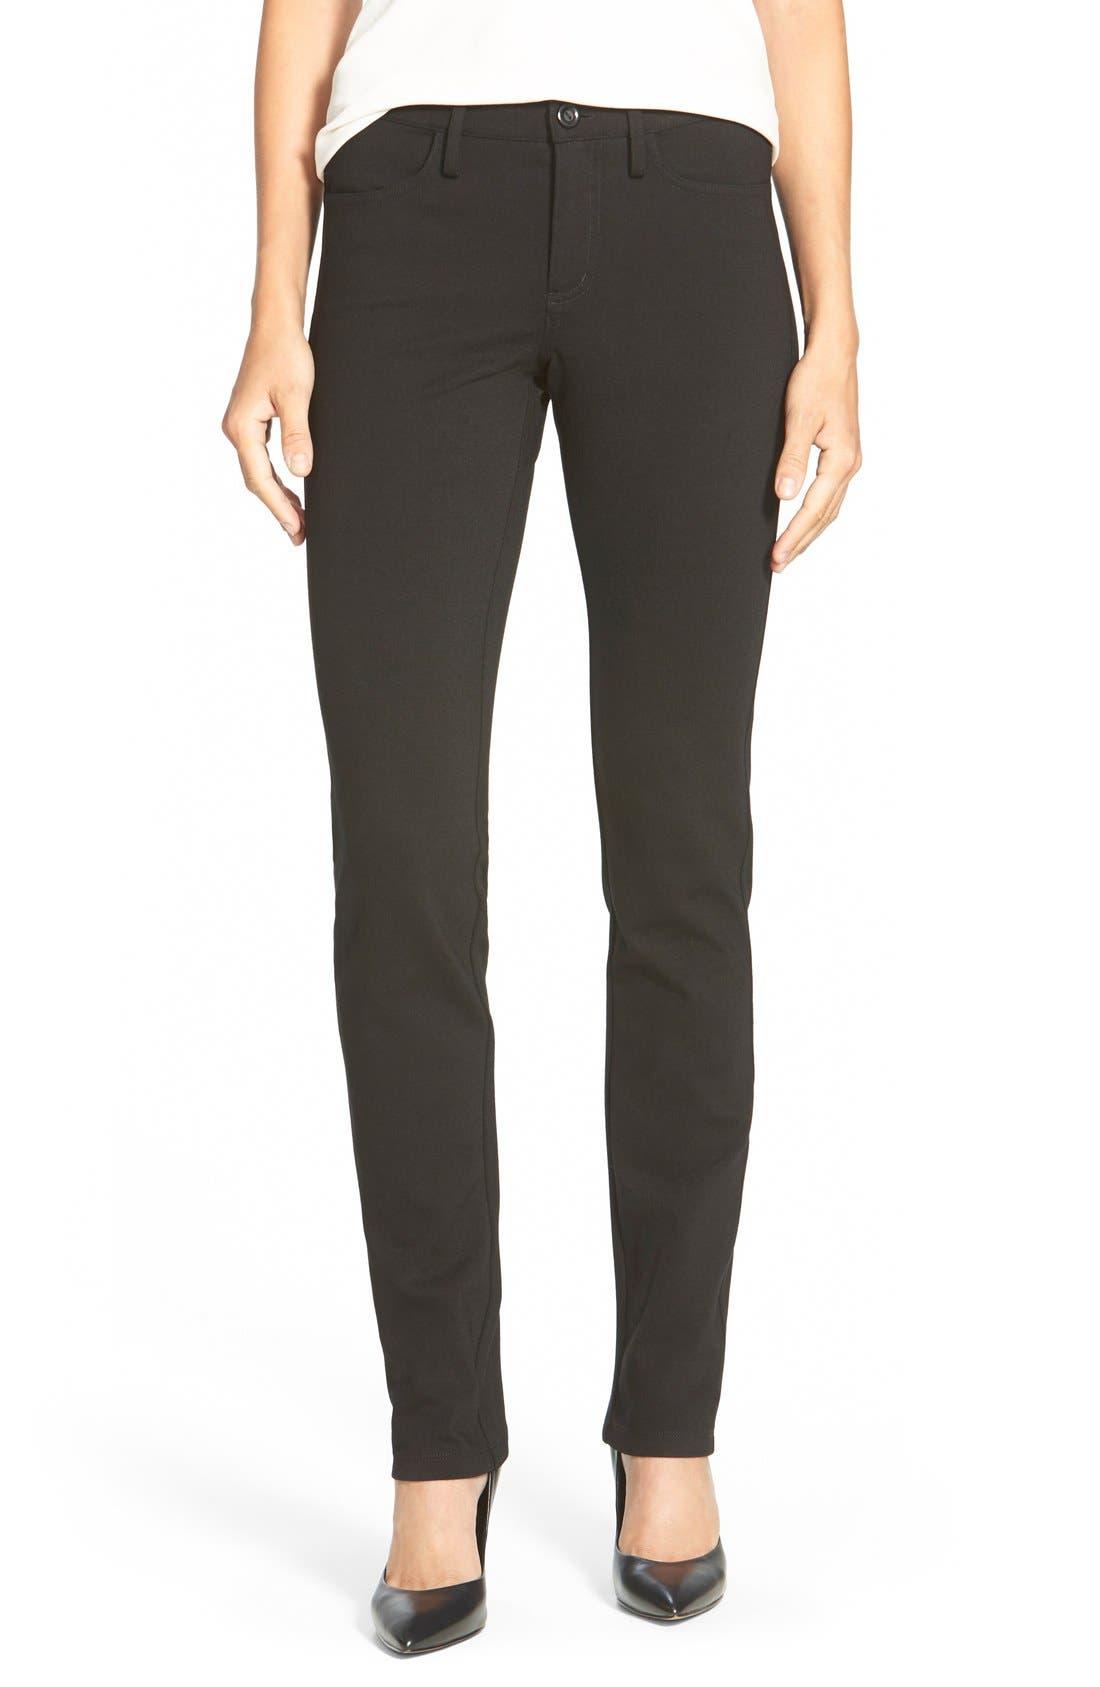 Alternate Image 1 Selected - NYDJ Five-Pocket Stretch Ponte Straight Leg Pants (Regular & Petite)